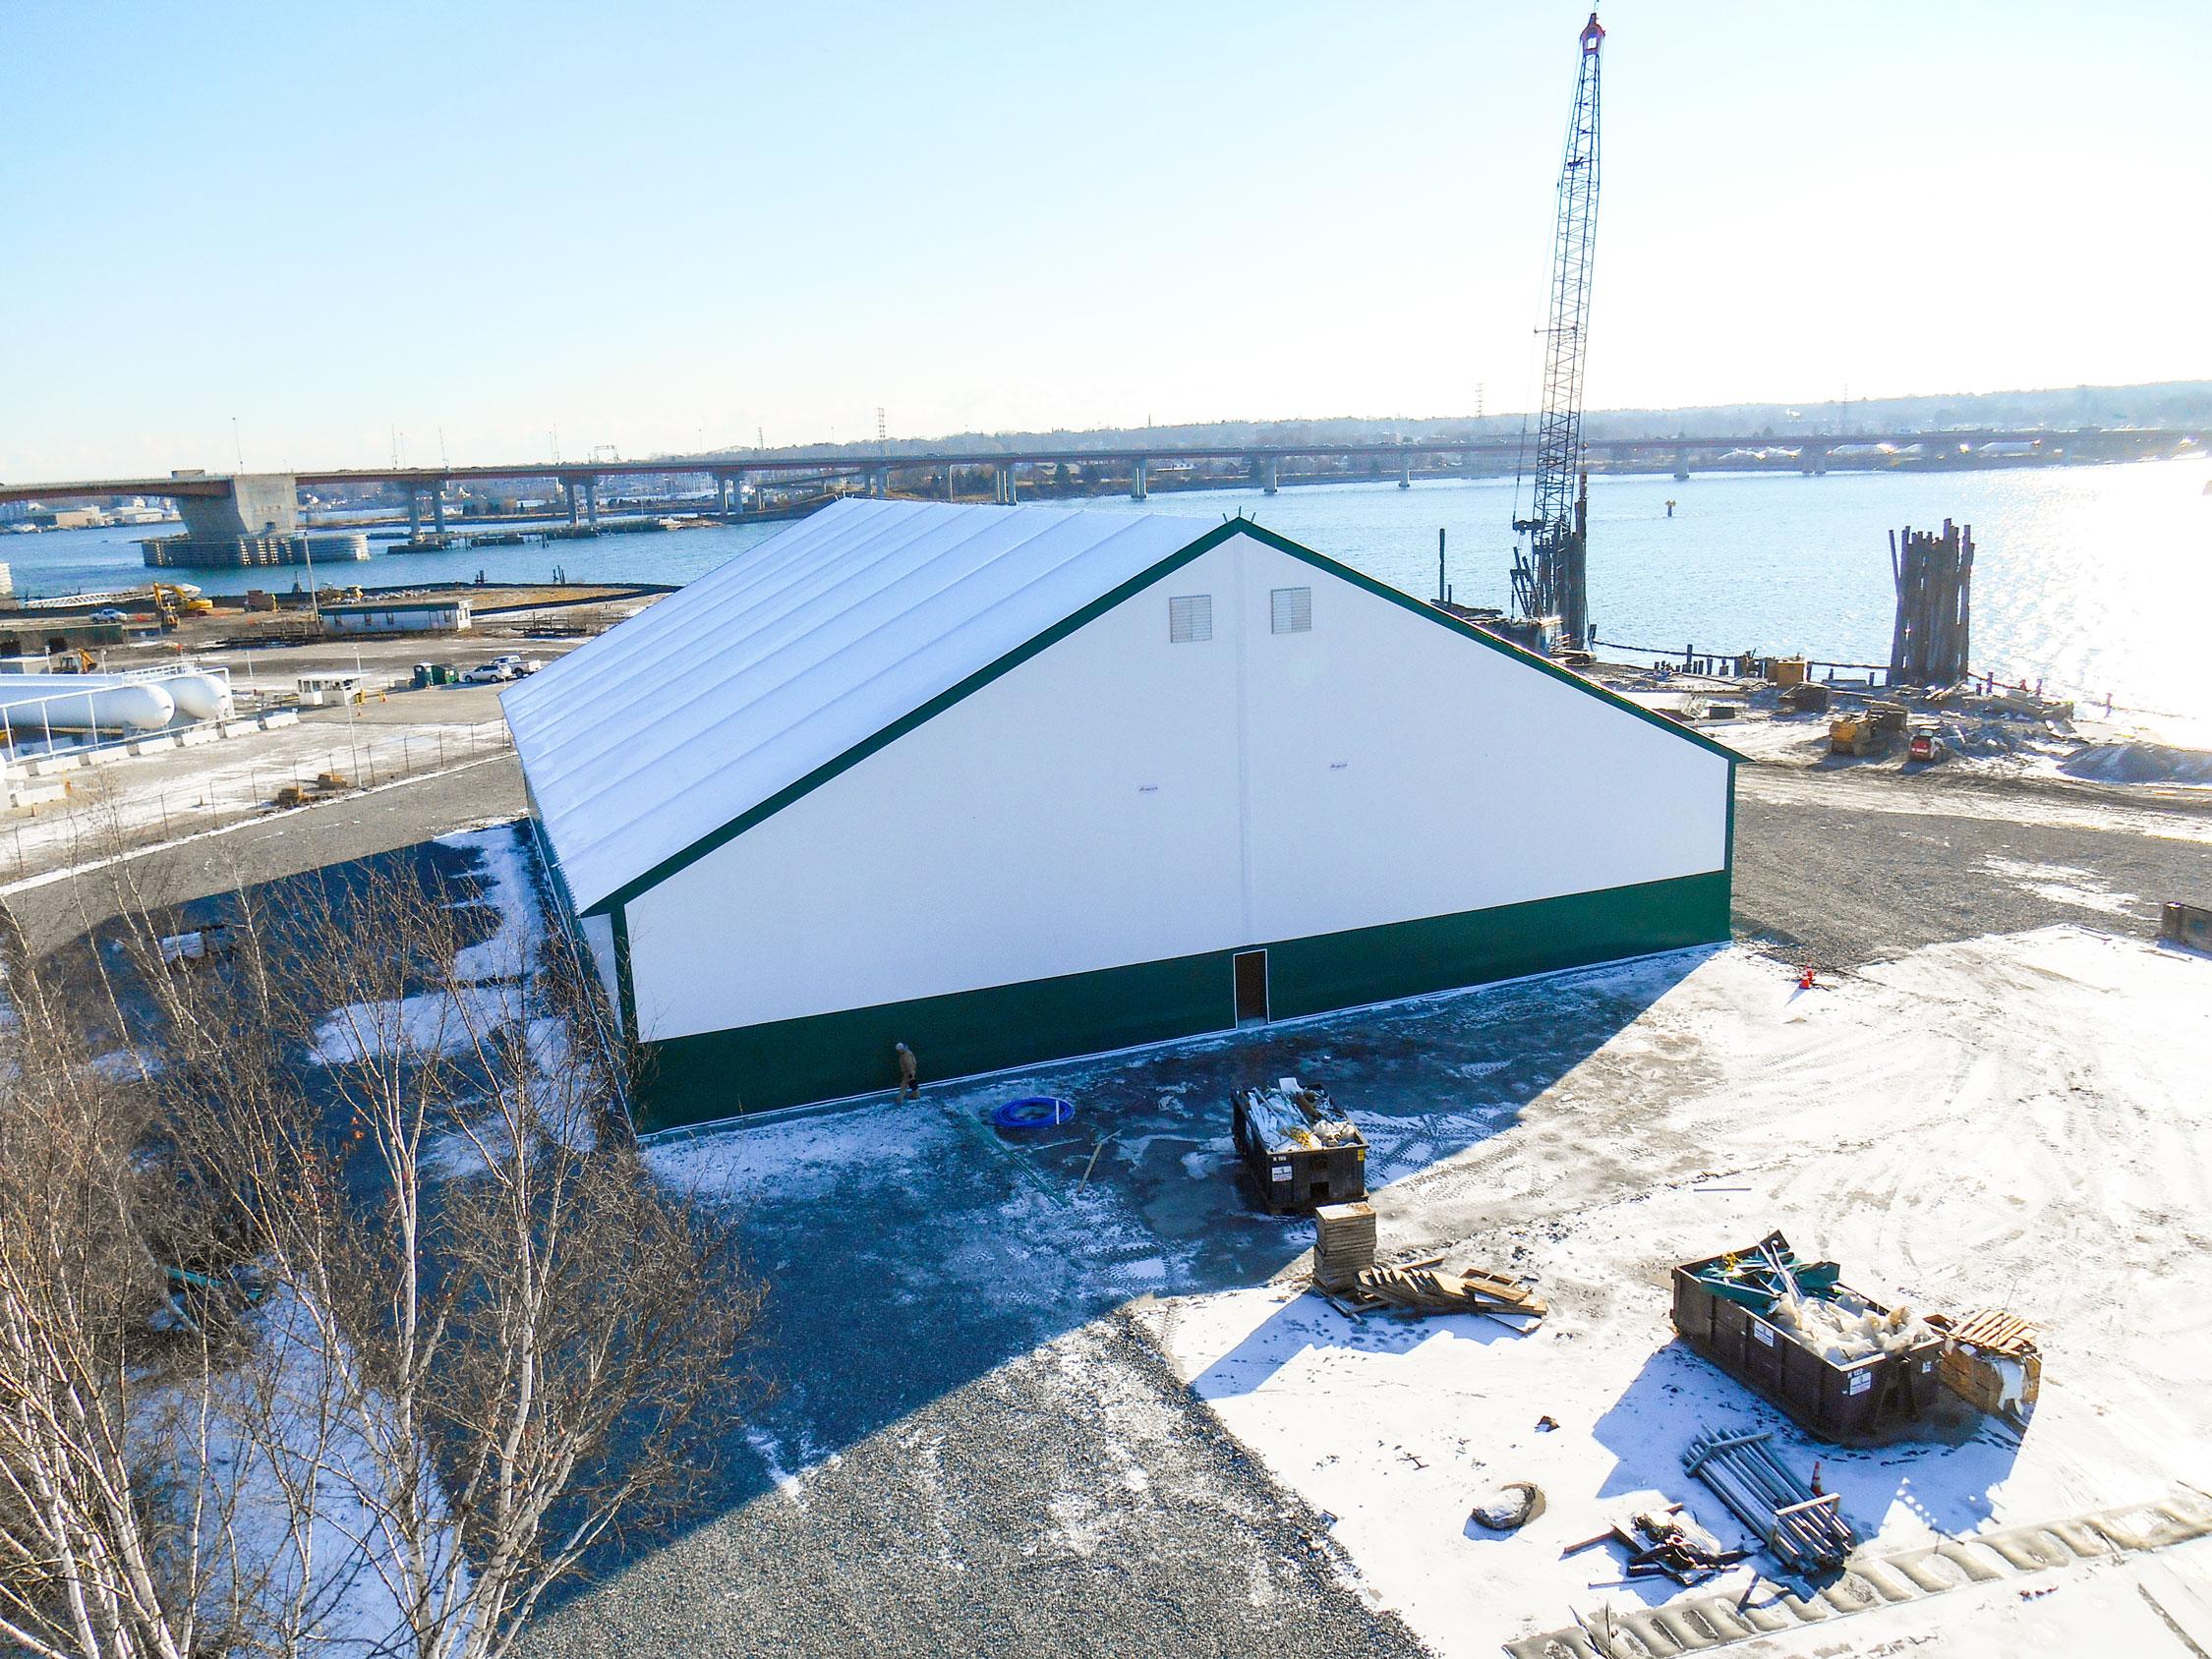 fabric yacht storage building